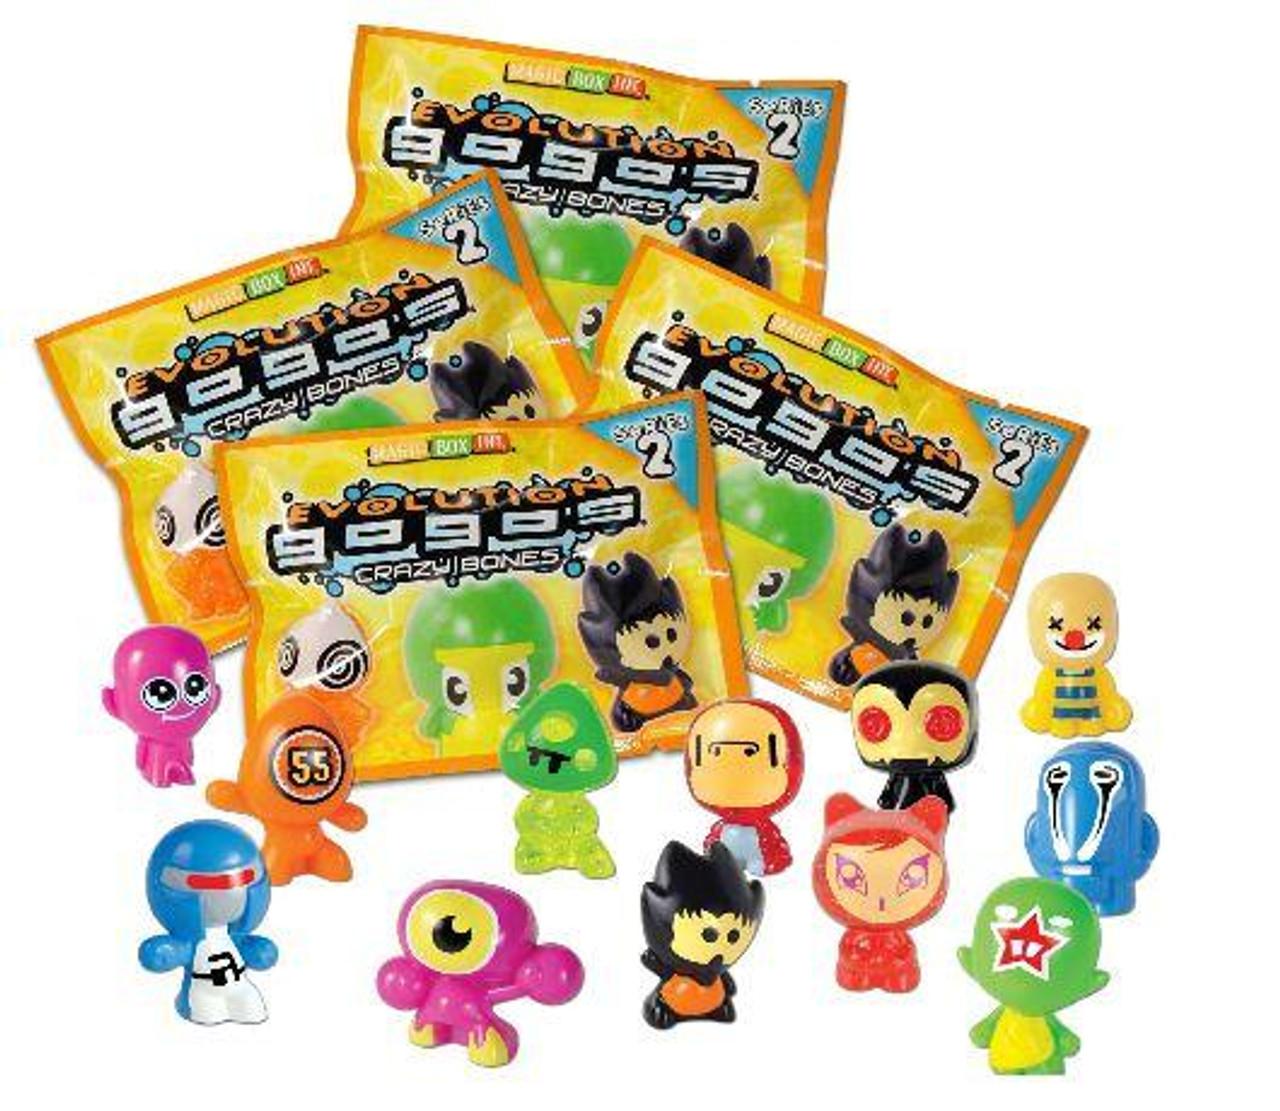 Crazy Bones Gogo's Series 2 Evolution Lot of 4 Booster Packs